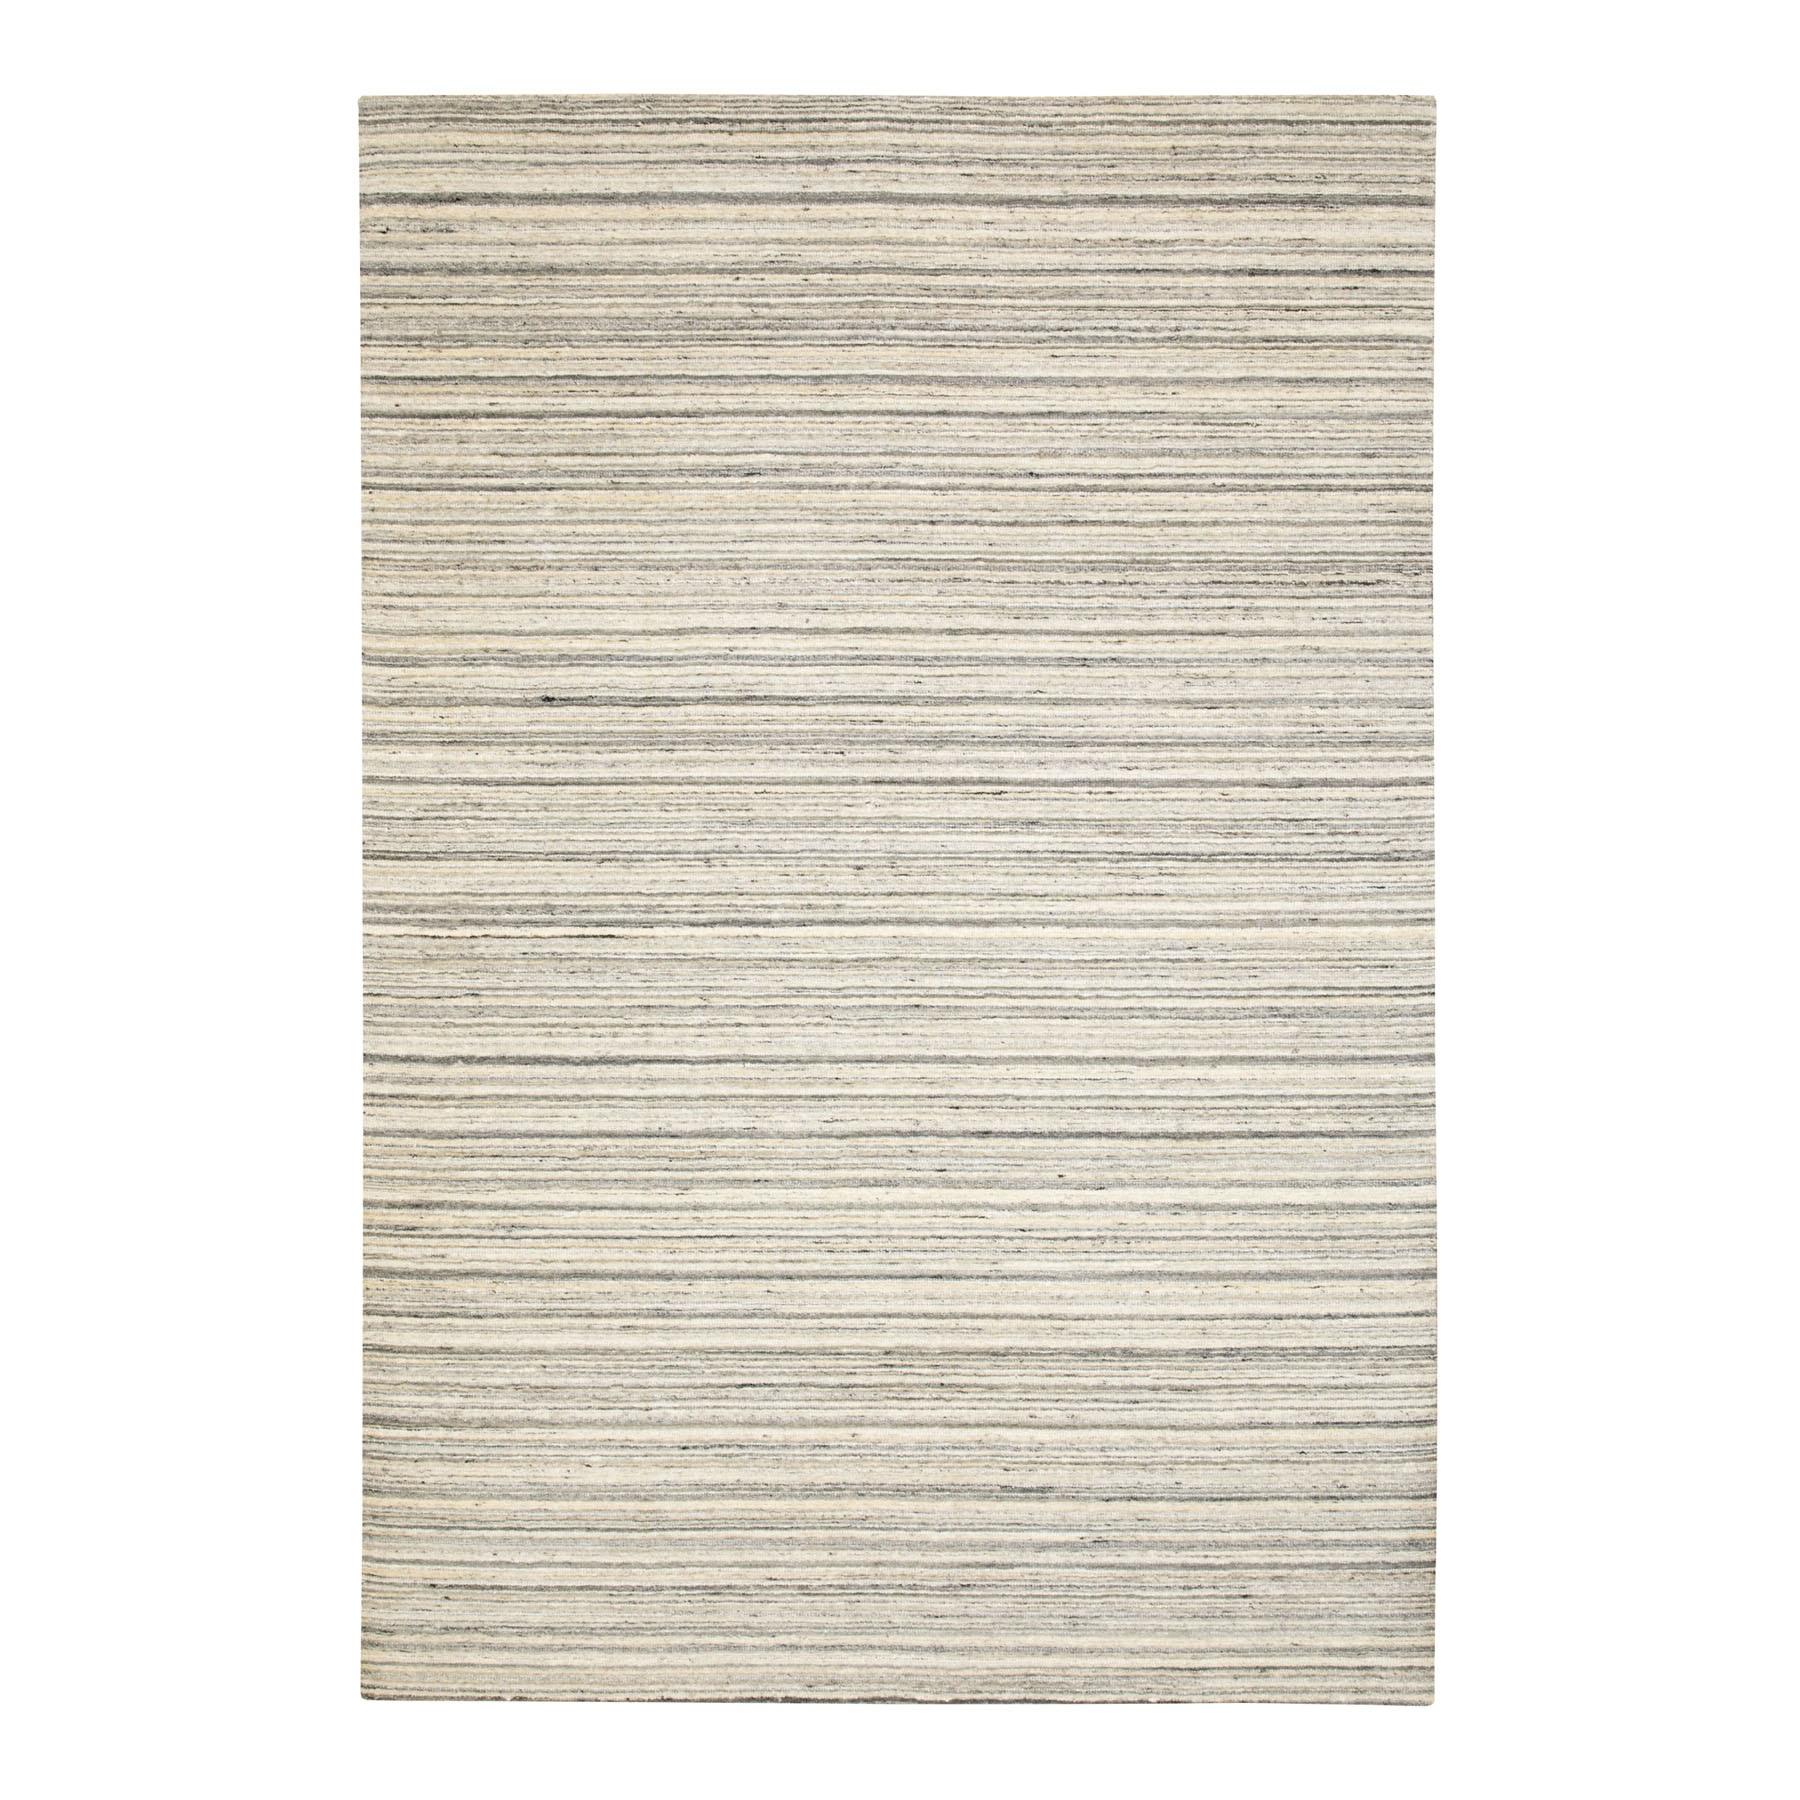 6'X9' Beige Hand Loomed Natural Wool Plain Modern Oriental Rug moae8c70